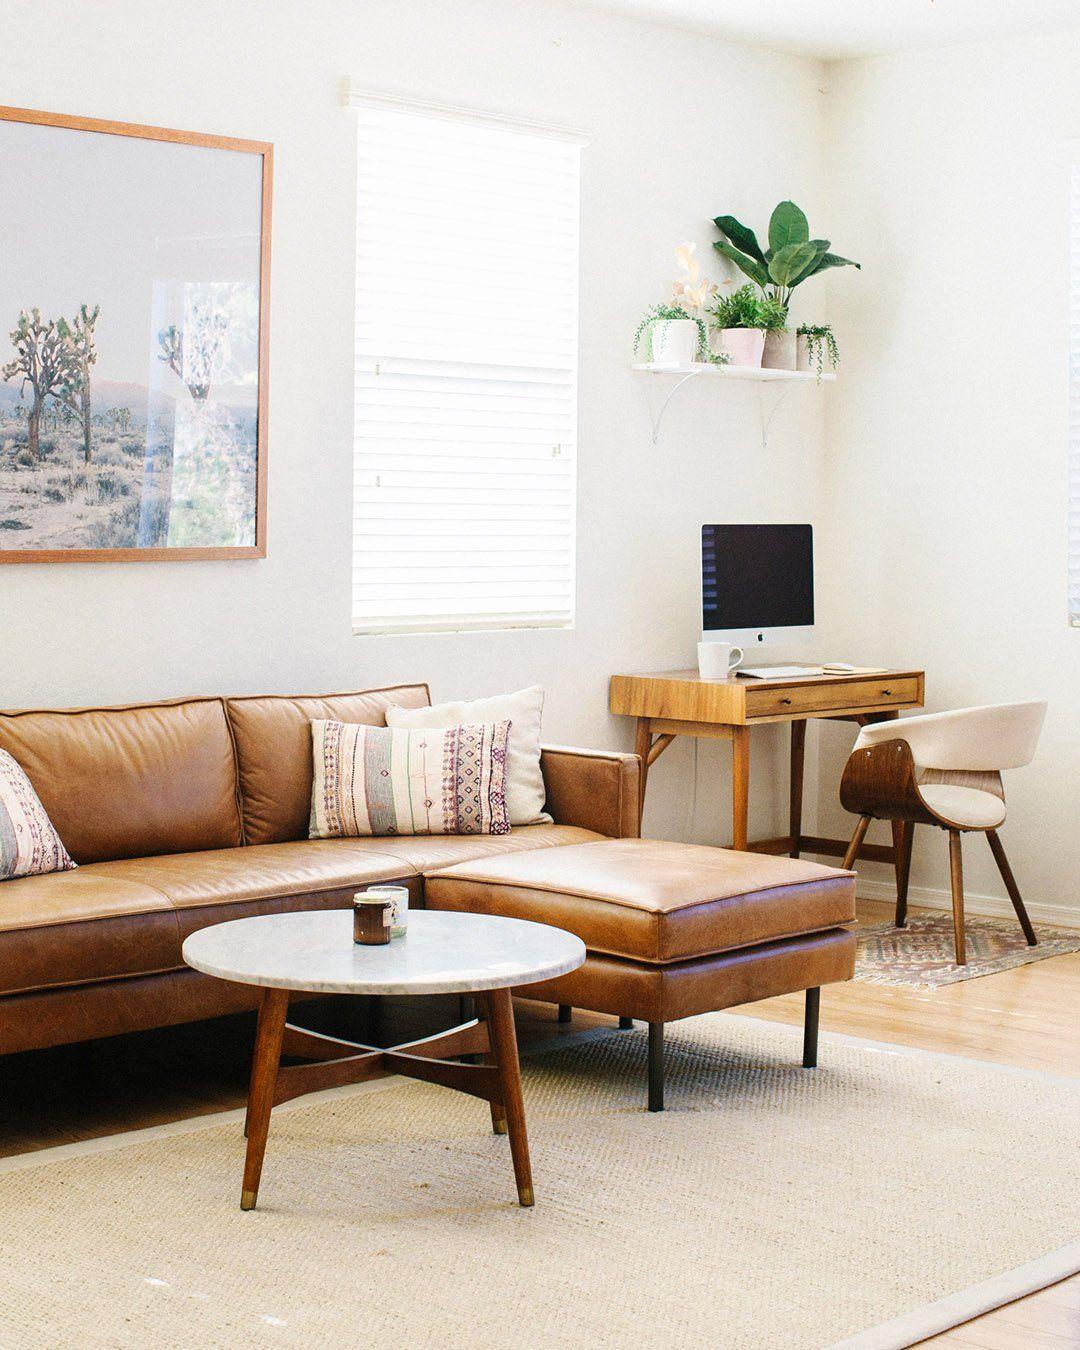 Bright Airy Eye Catching We Re Crushing On Ashleytkim S Arizona Mid Century Modern Living Room Decor Living Room Decor Modern Mid Century Living Room Decor